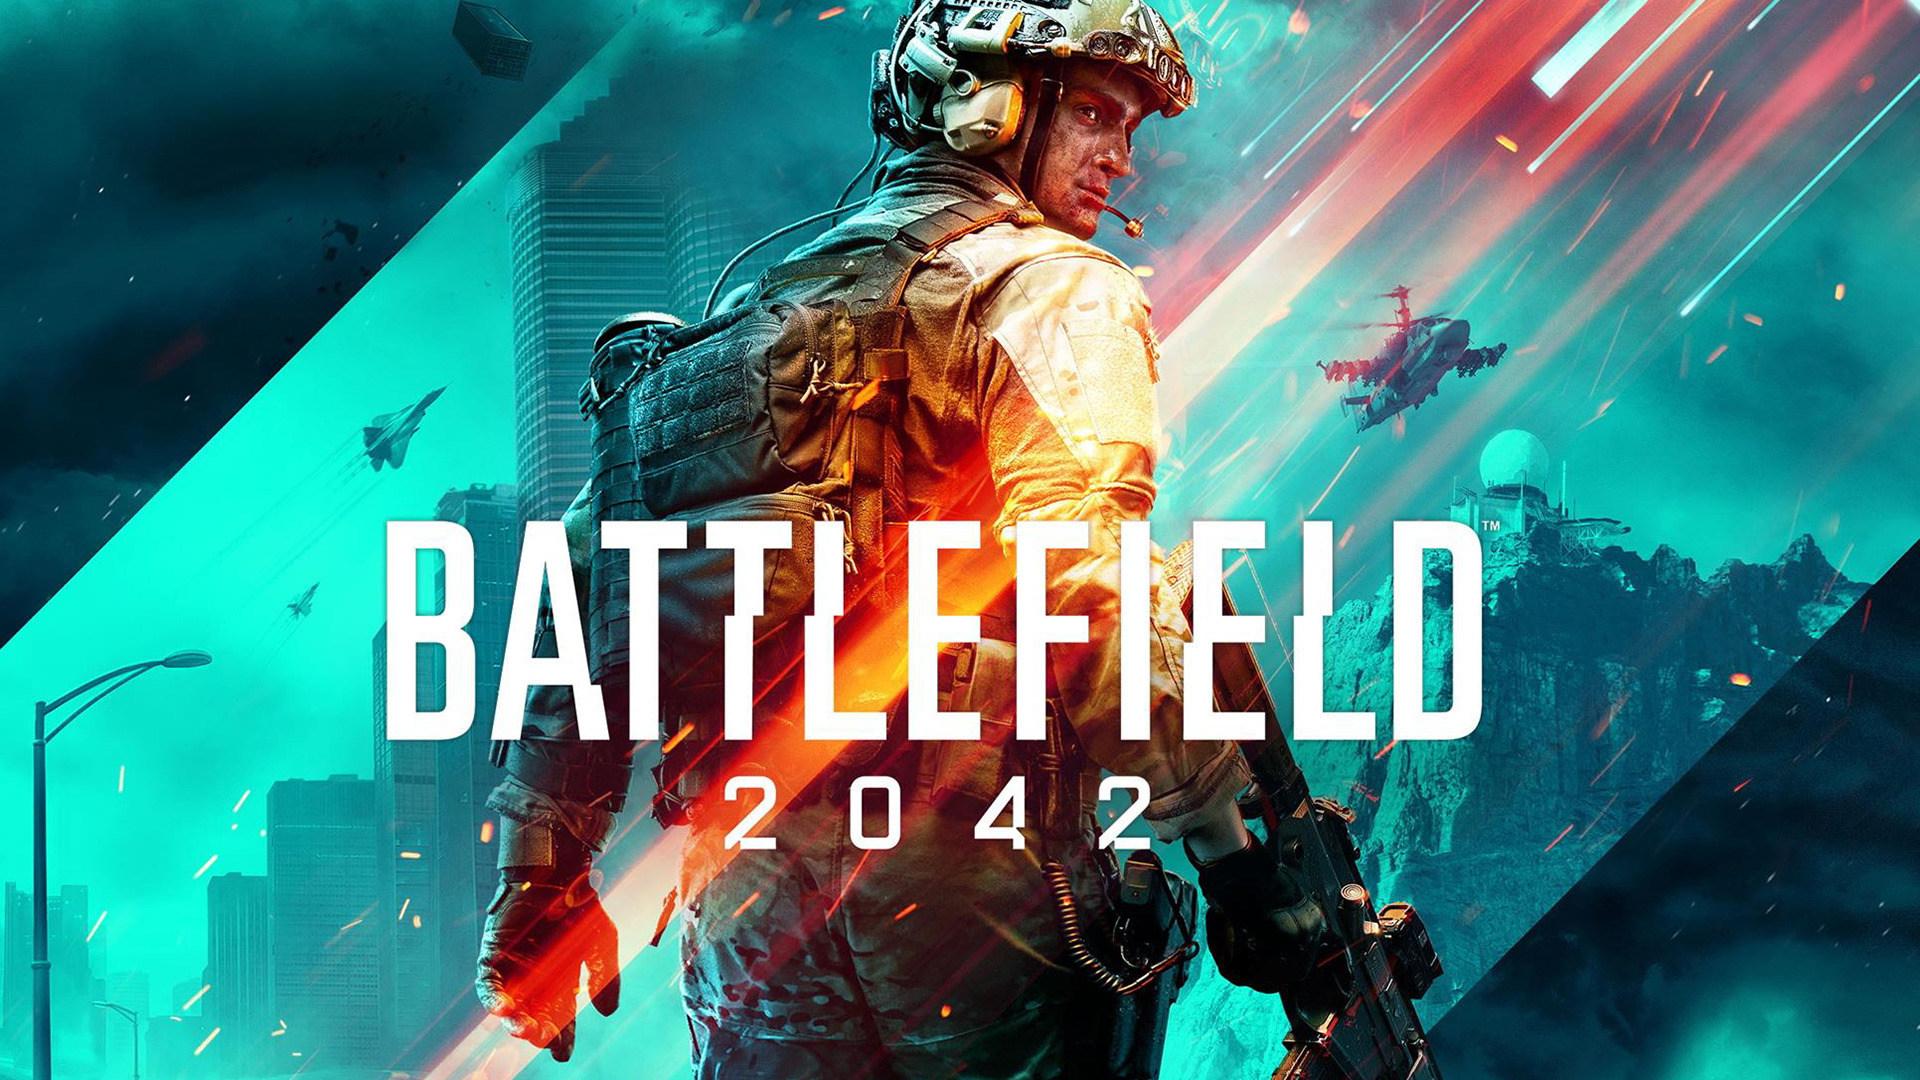 Trailer, Logo, Battlefield, Battlefield 2042